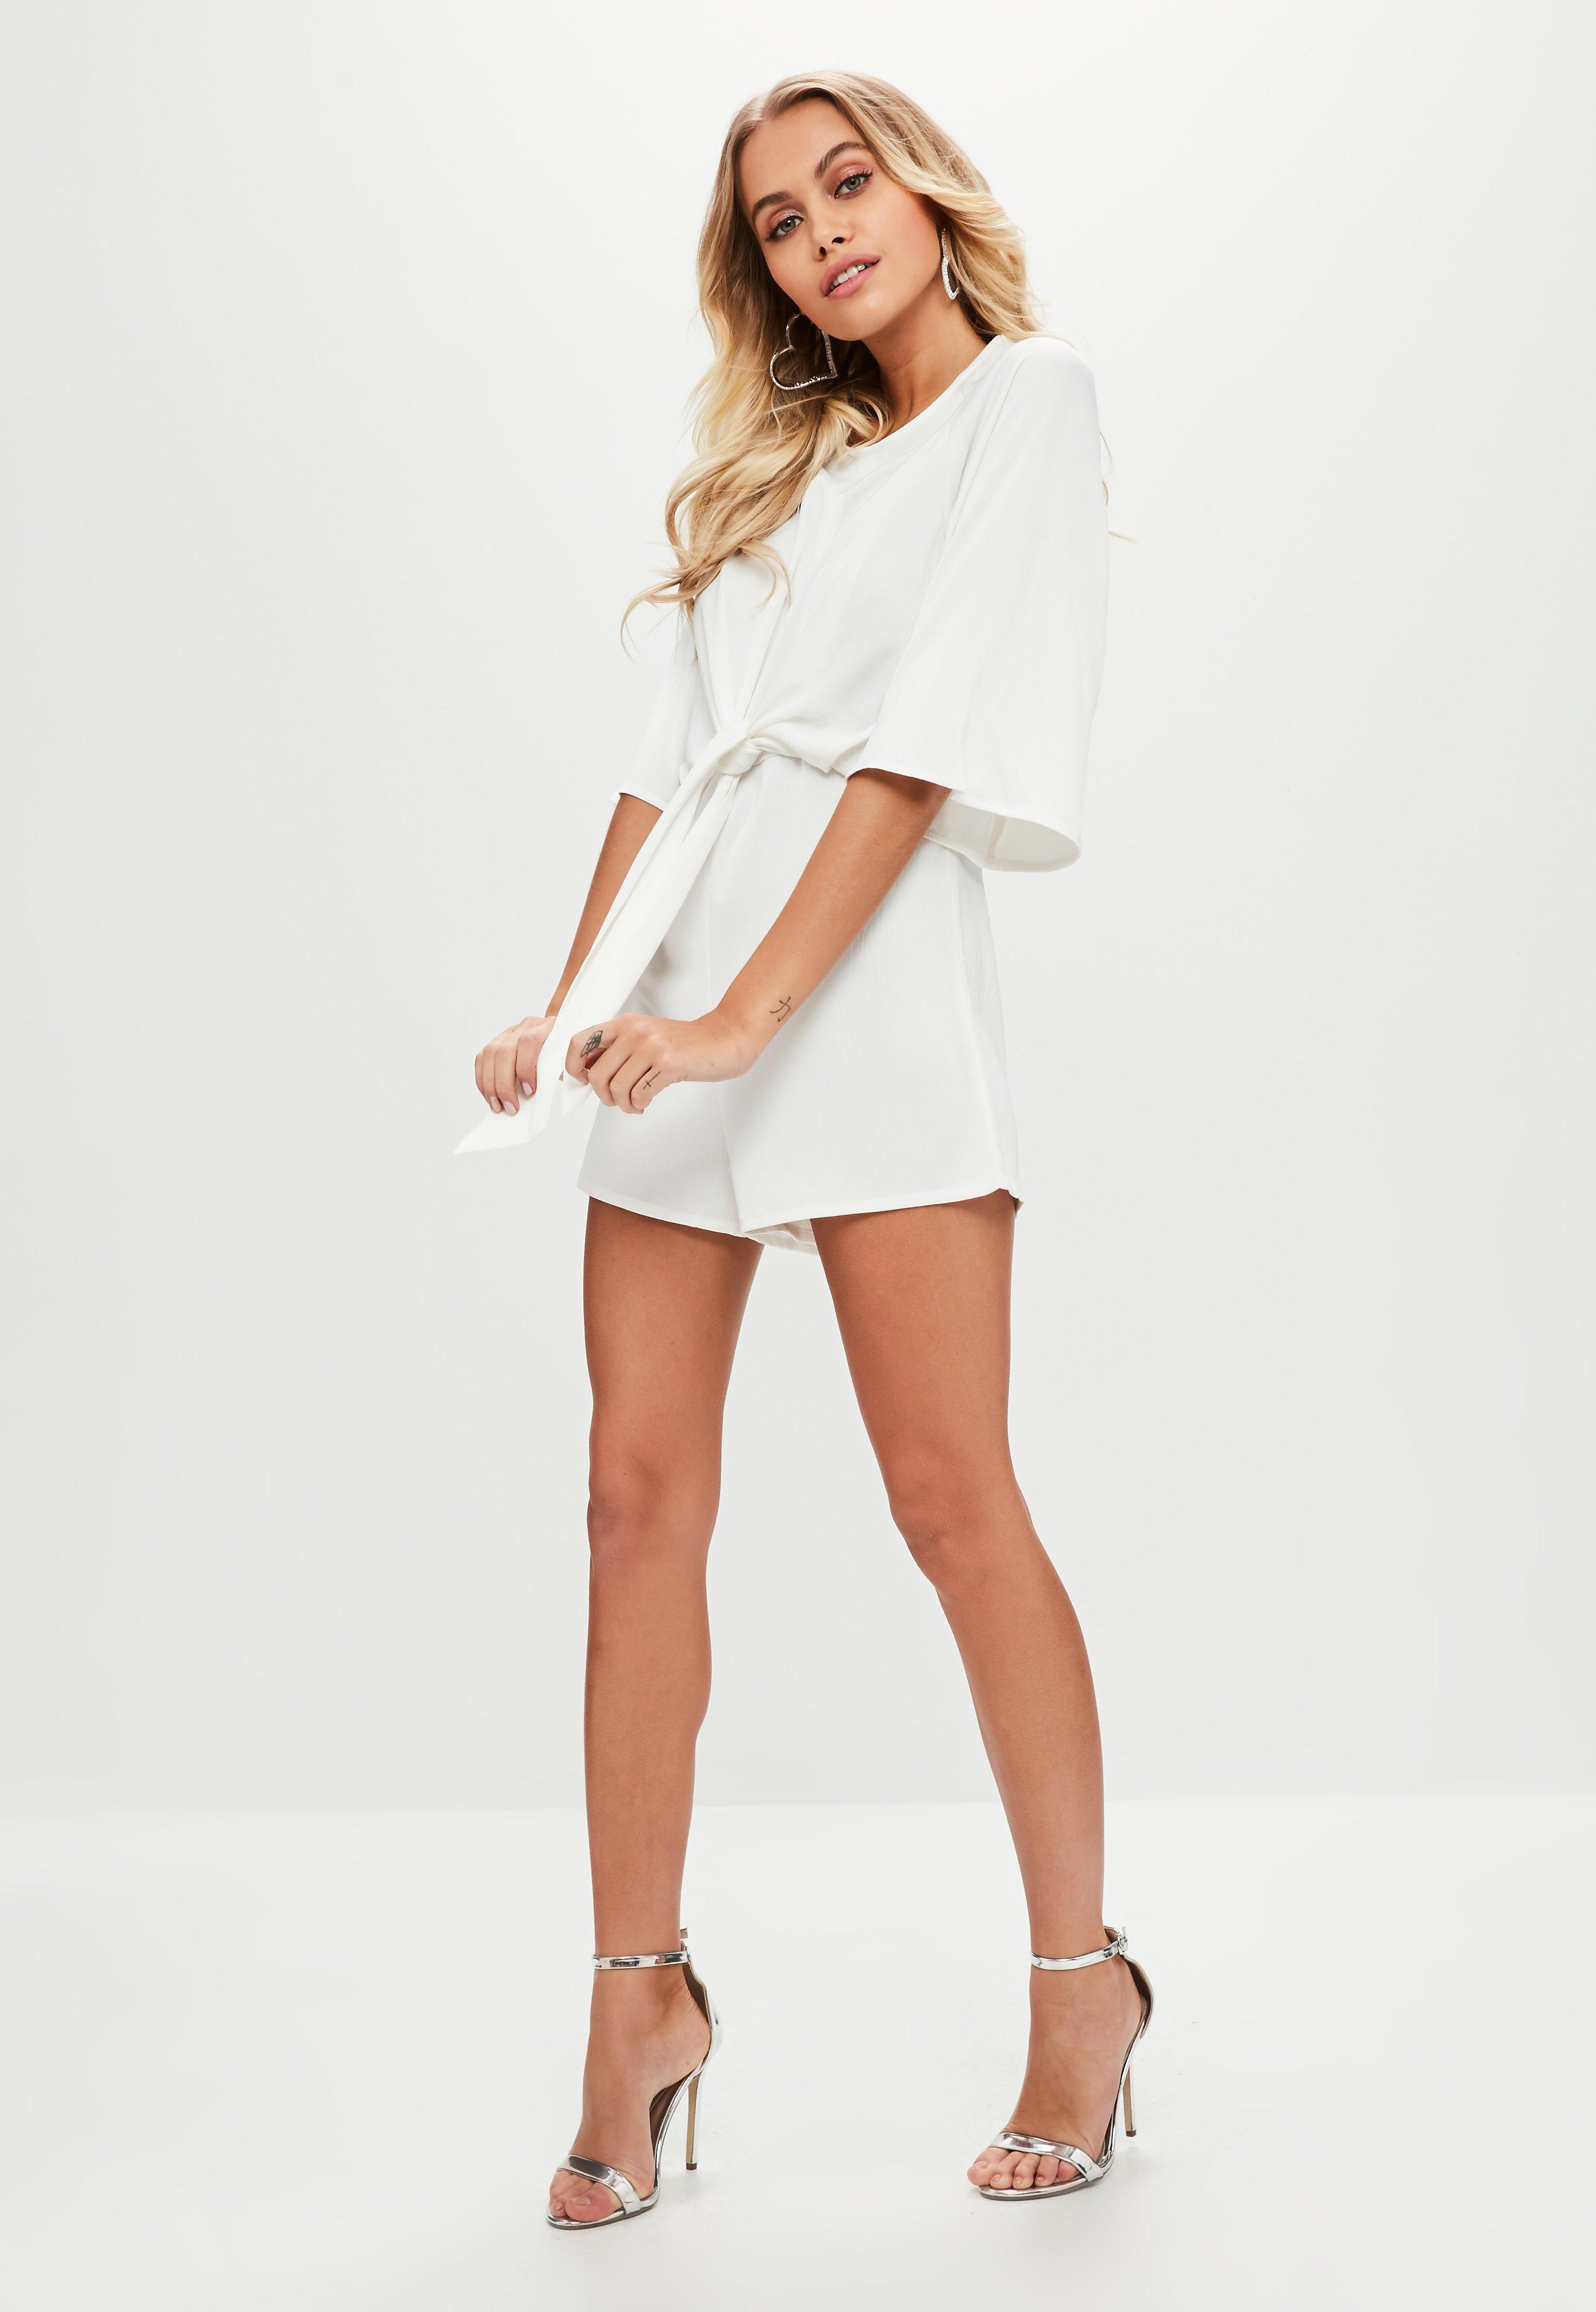 768f0c89fd7 Lyst - Missguided White Tie Front Kimono Sleeve Romper in White